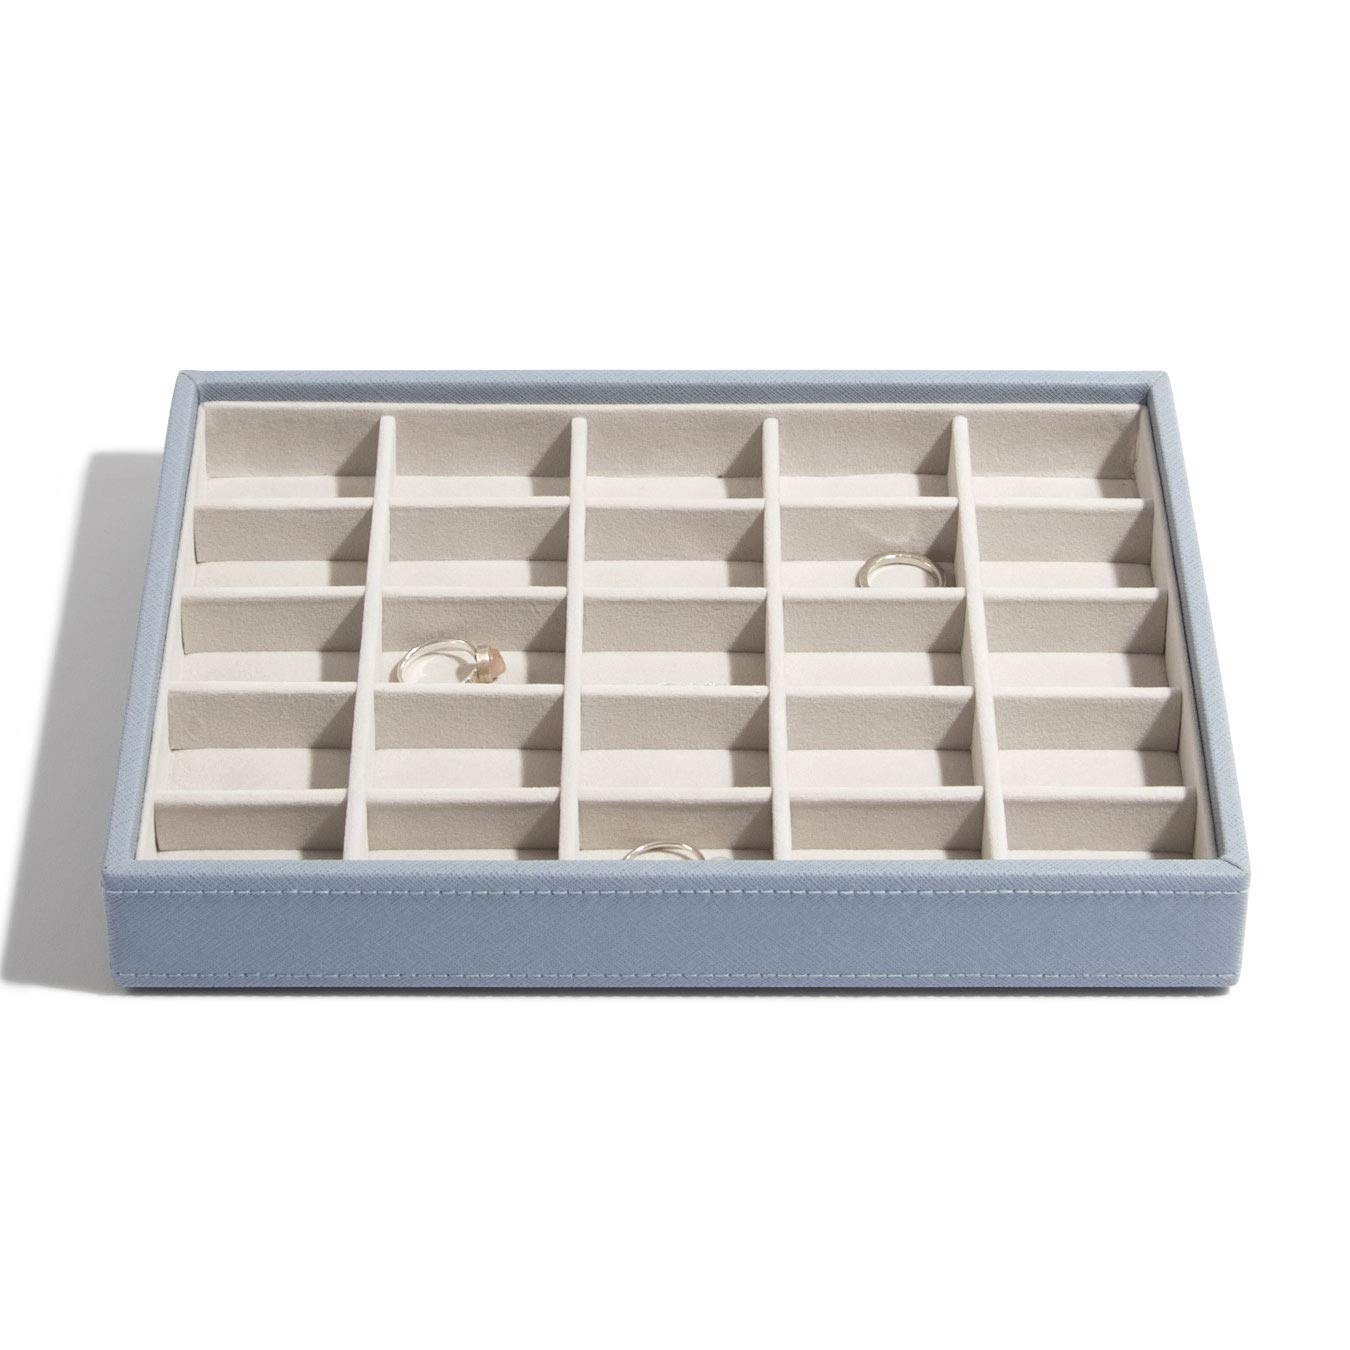 Satin Nickel Standard Plumbing Supply Ebbe E4813-SN 4 Unique Grate Diamond